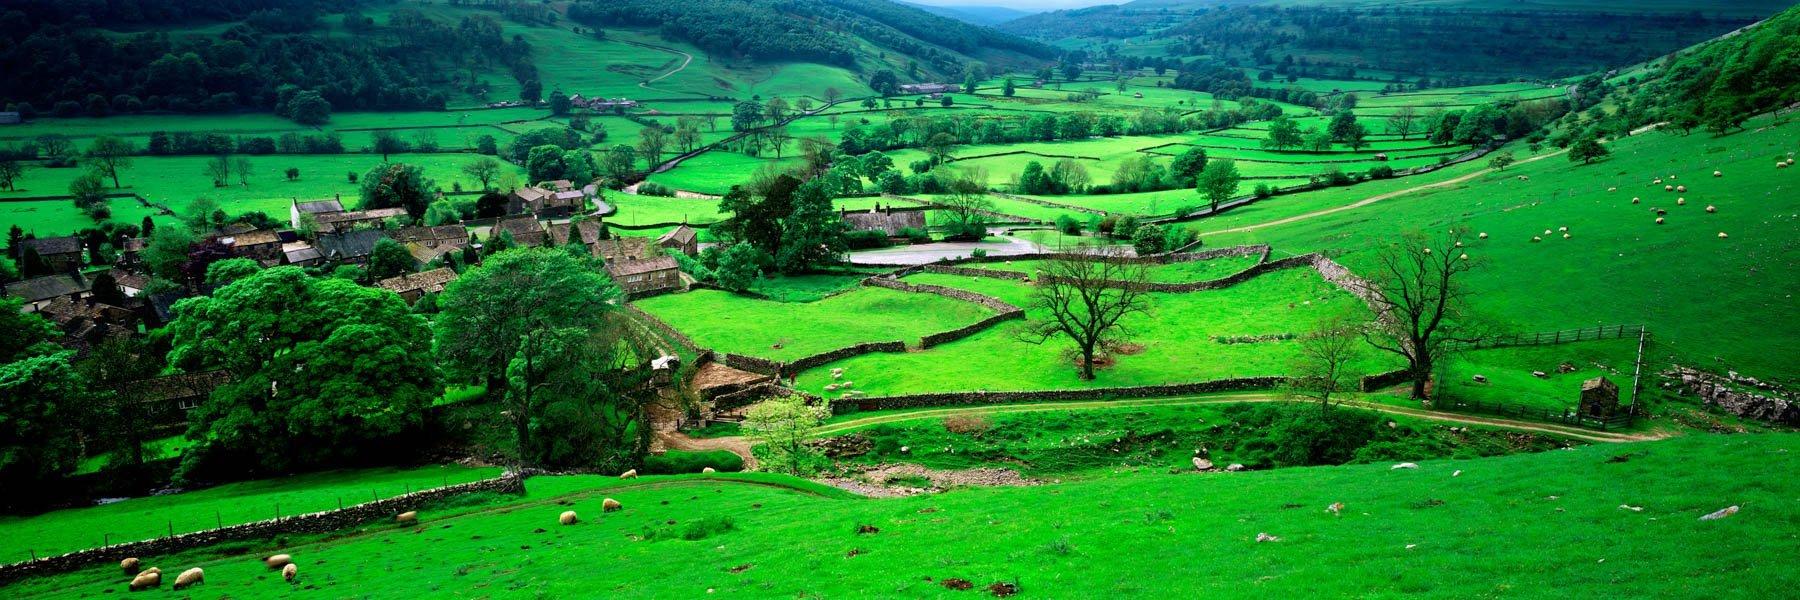 Sheep farms in the quaint English village of Buckden, Yorkshore, UK.